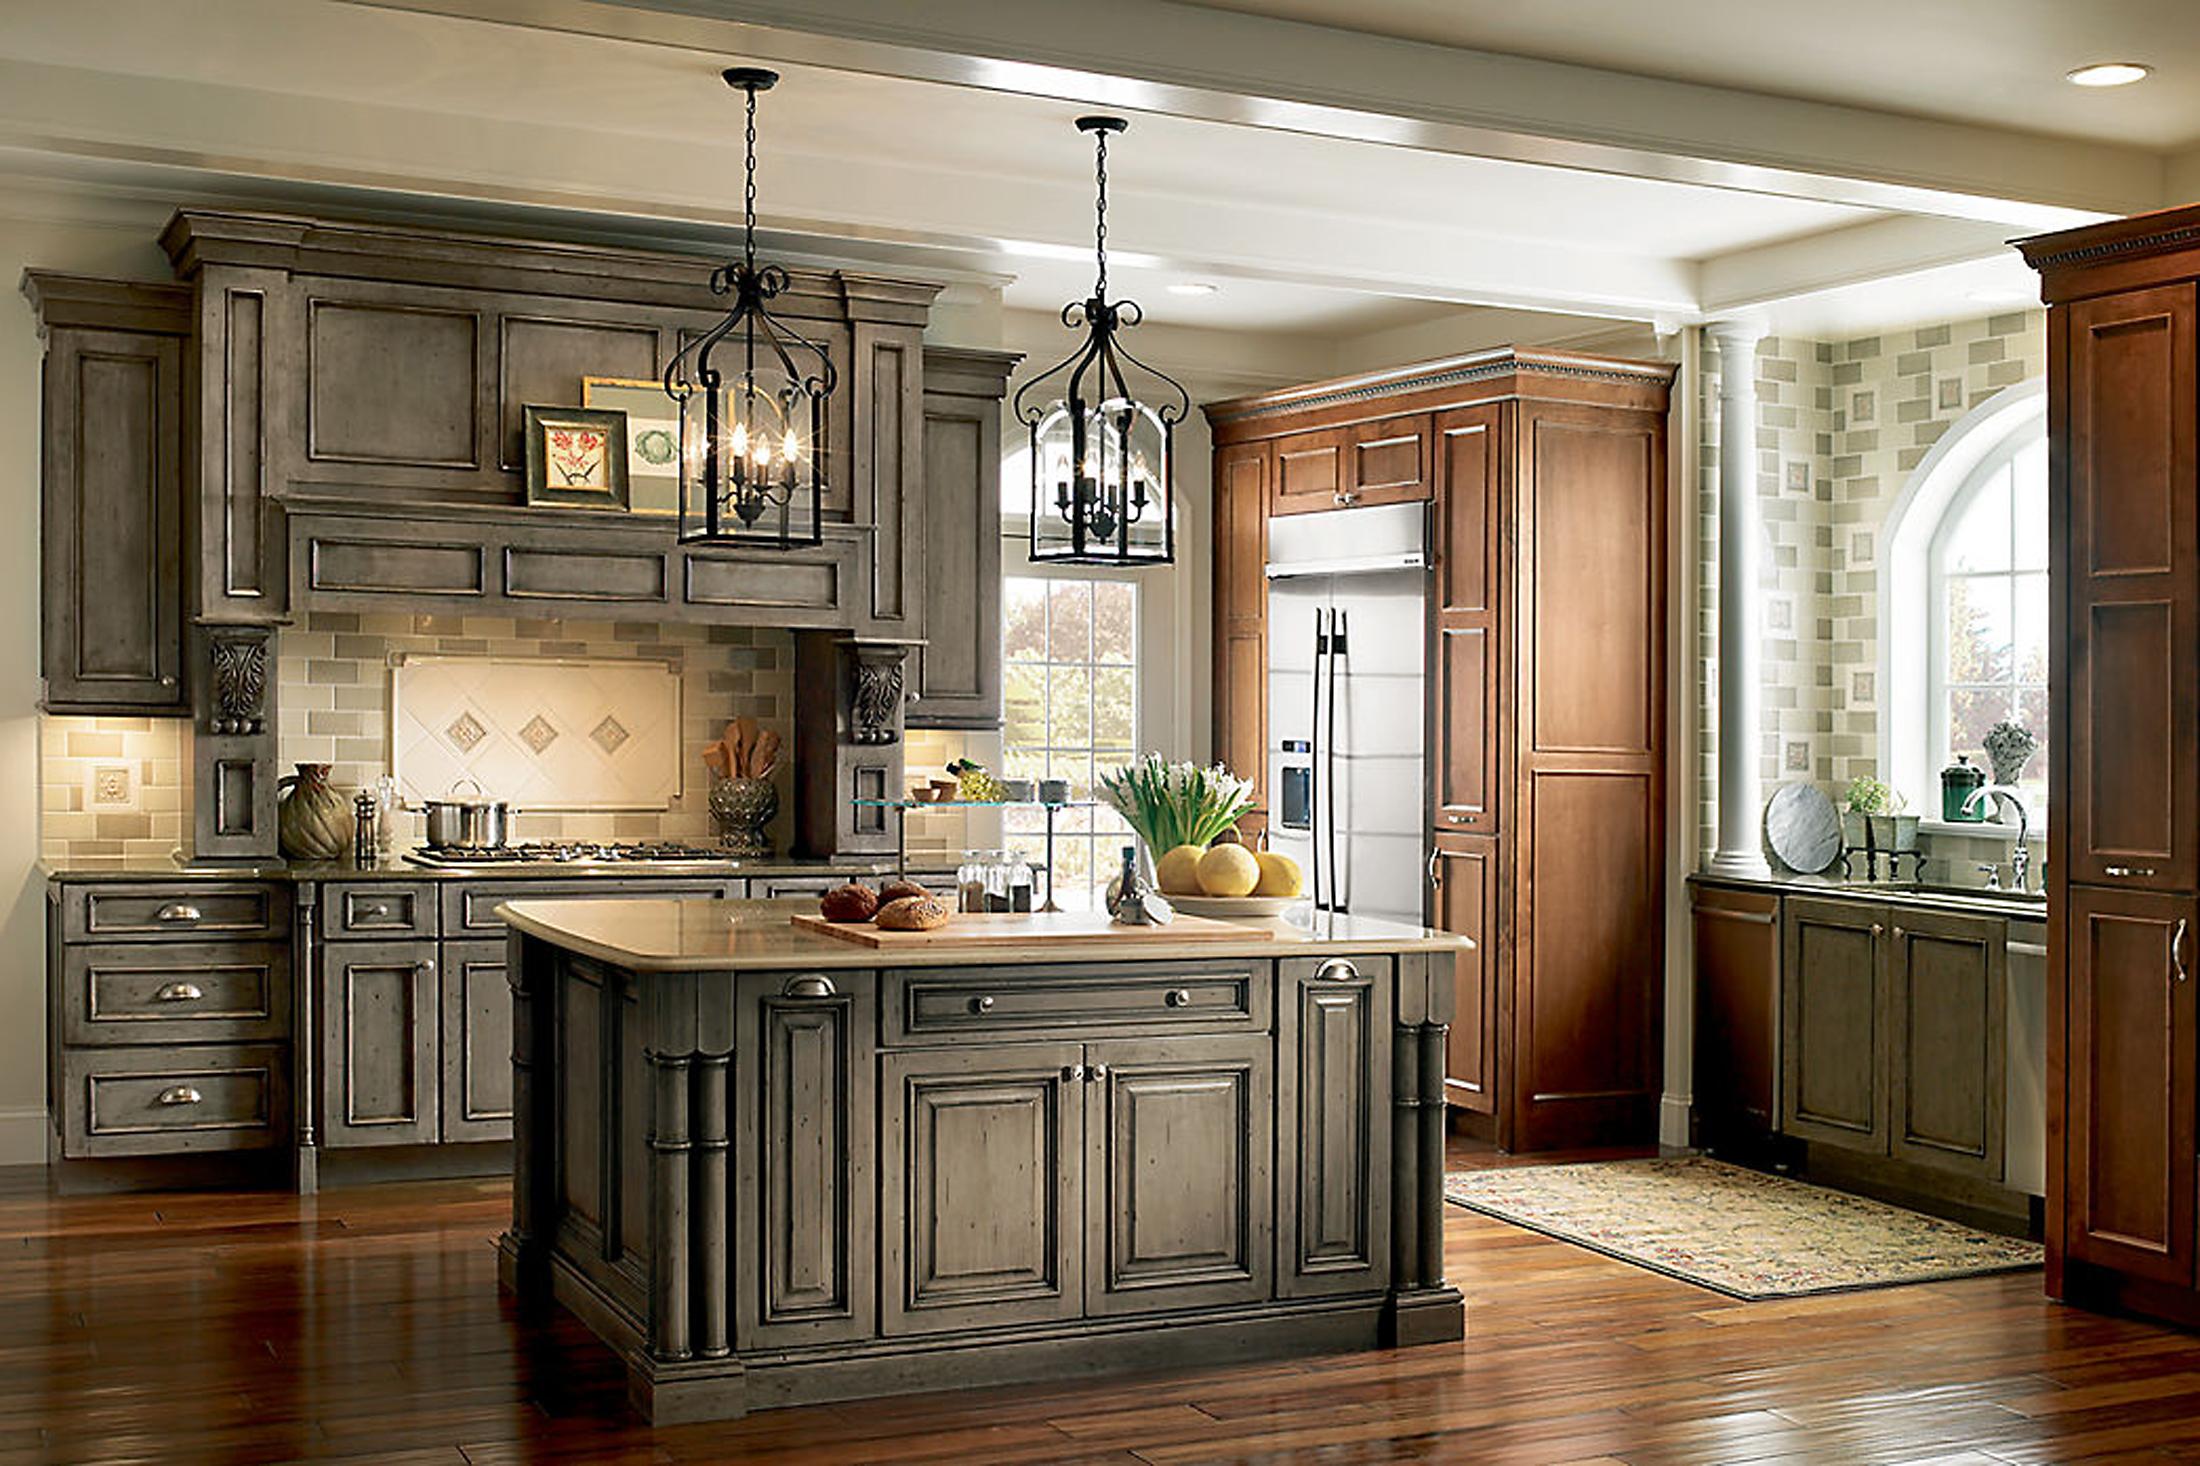 High gloss kitchens mastercraft kitchens - Mastercraft Kitchen Cabinets Medallion Cabinets Catalog Yorktown Cabinets